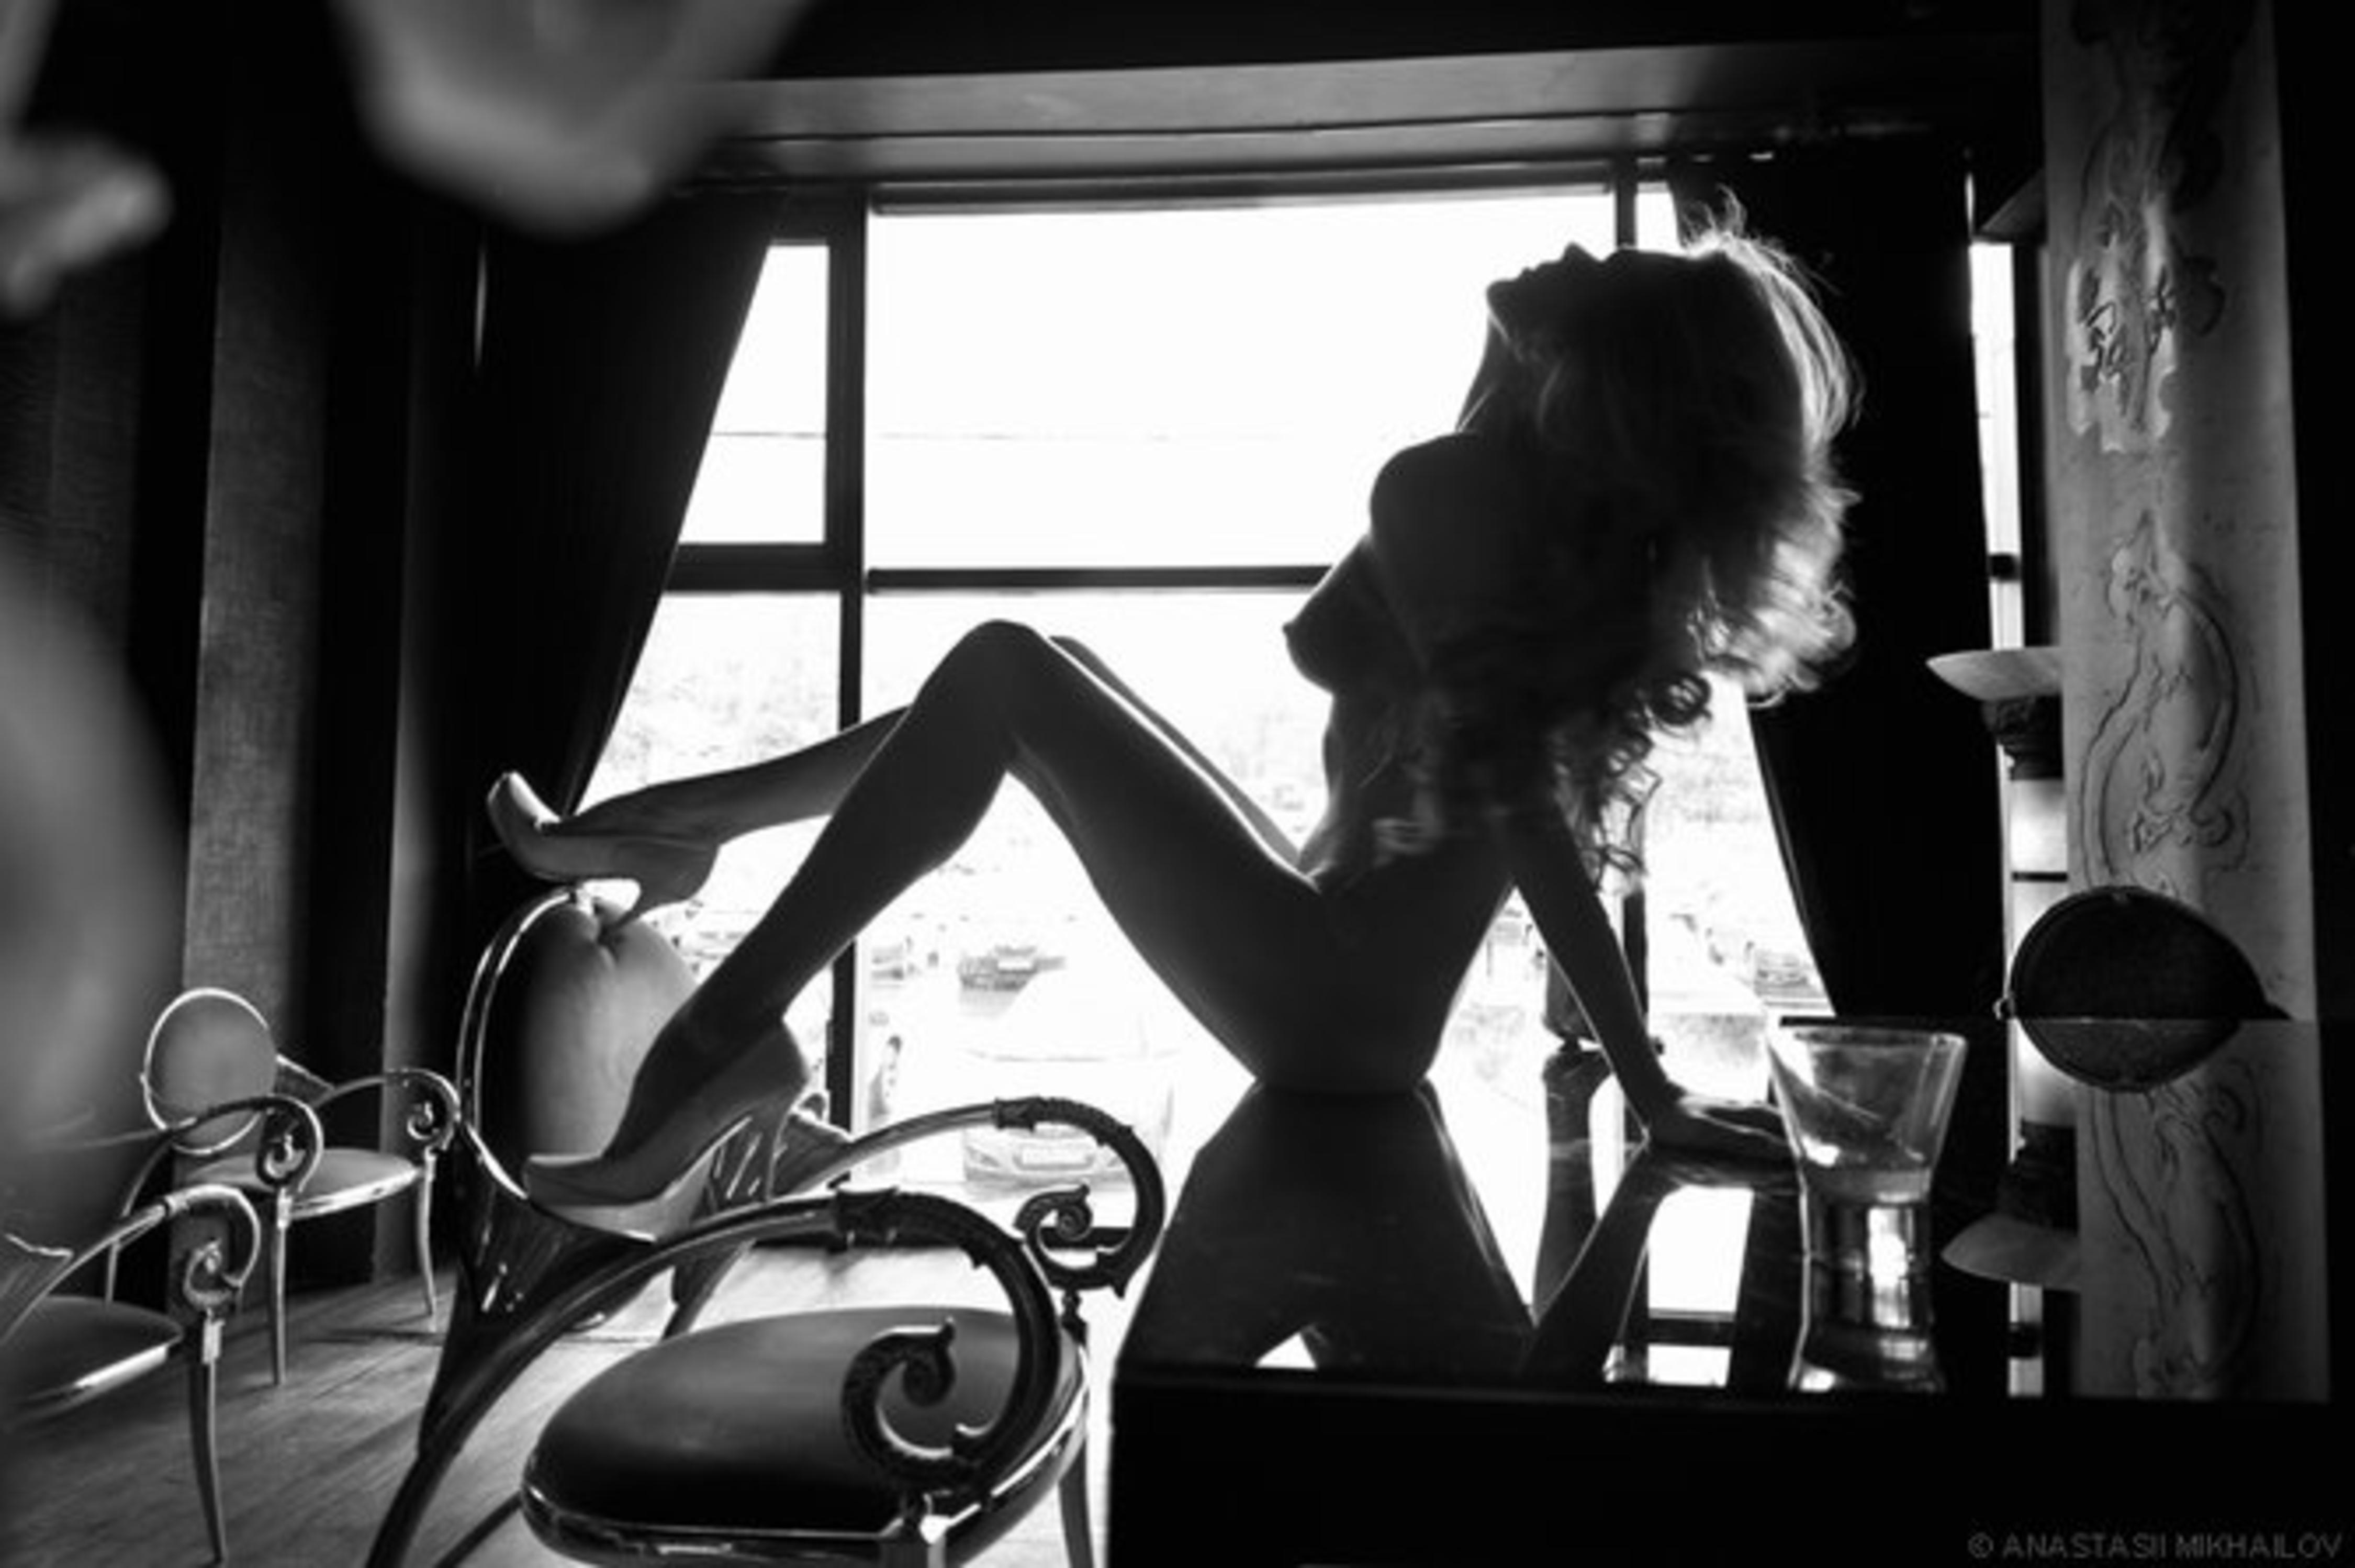 Секс на рояле картинки 5 фотография